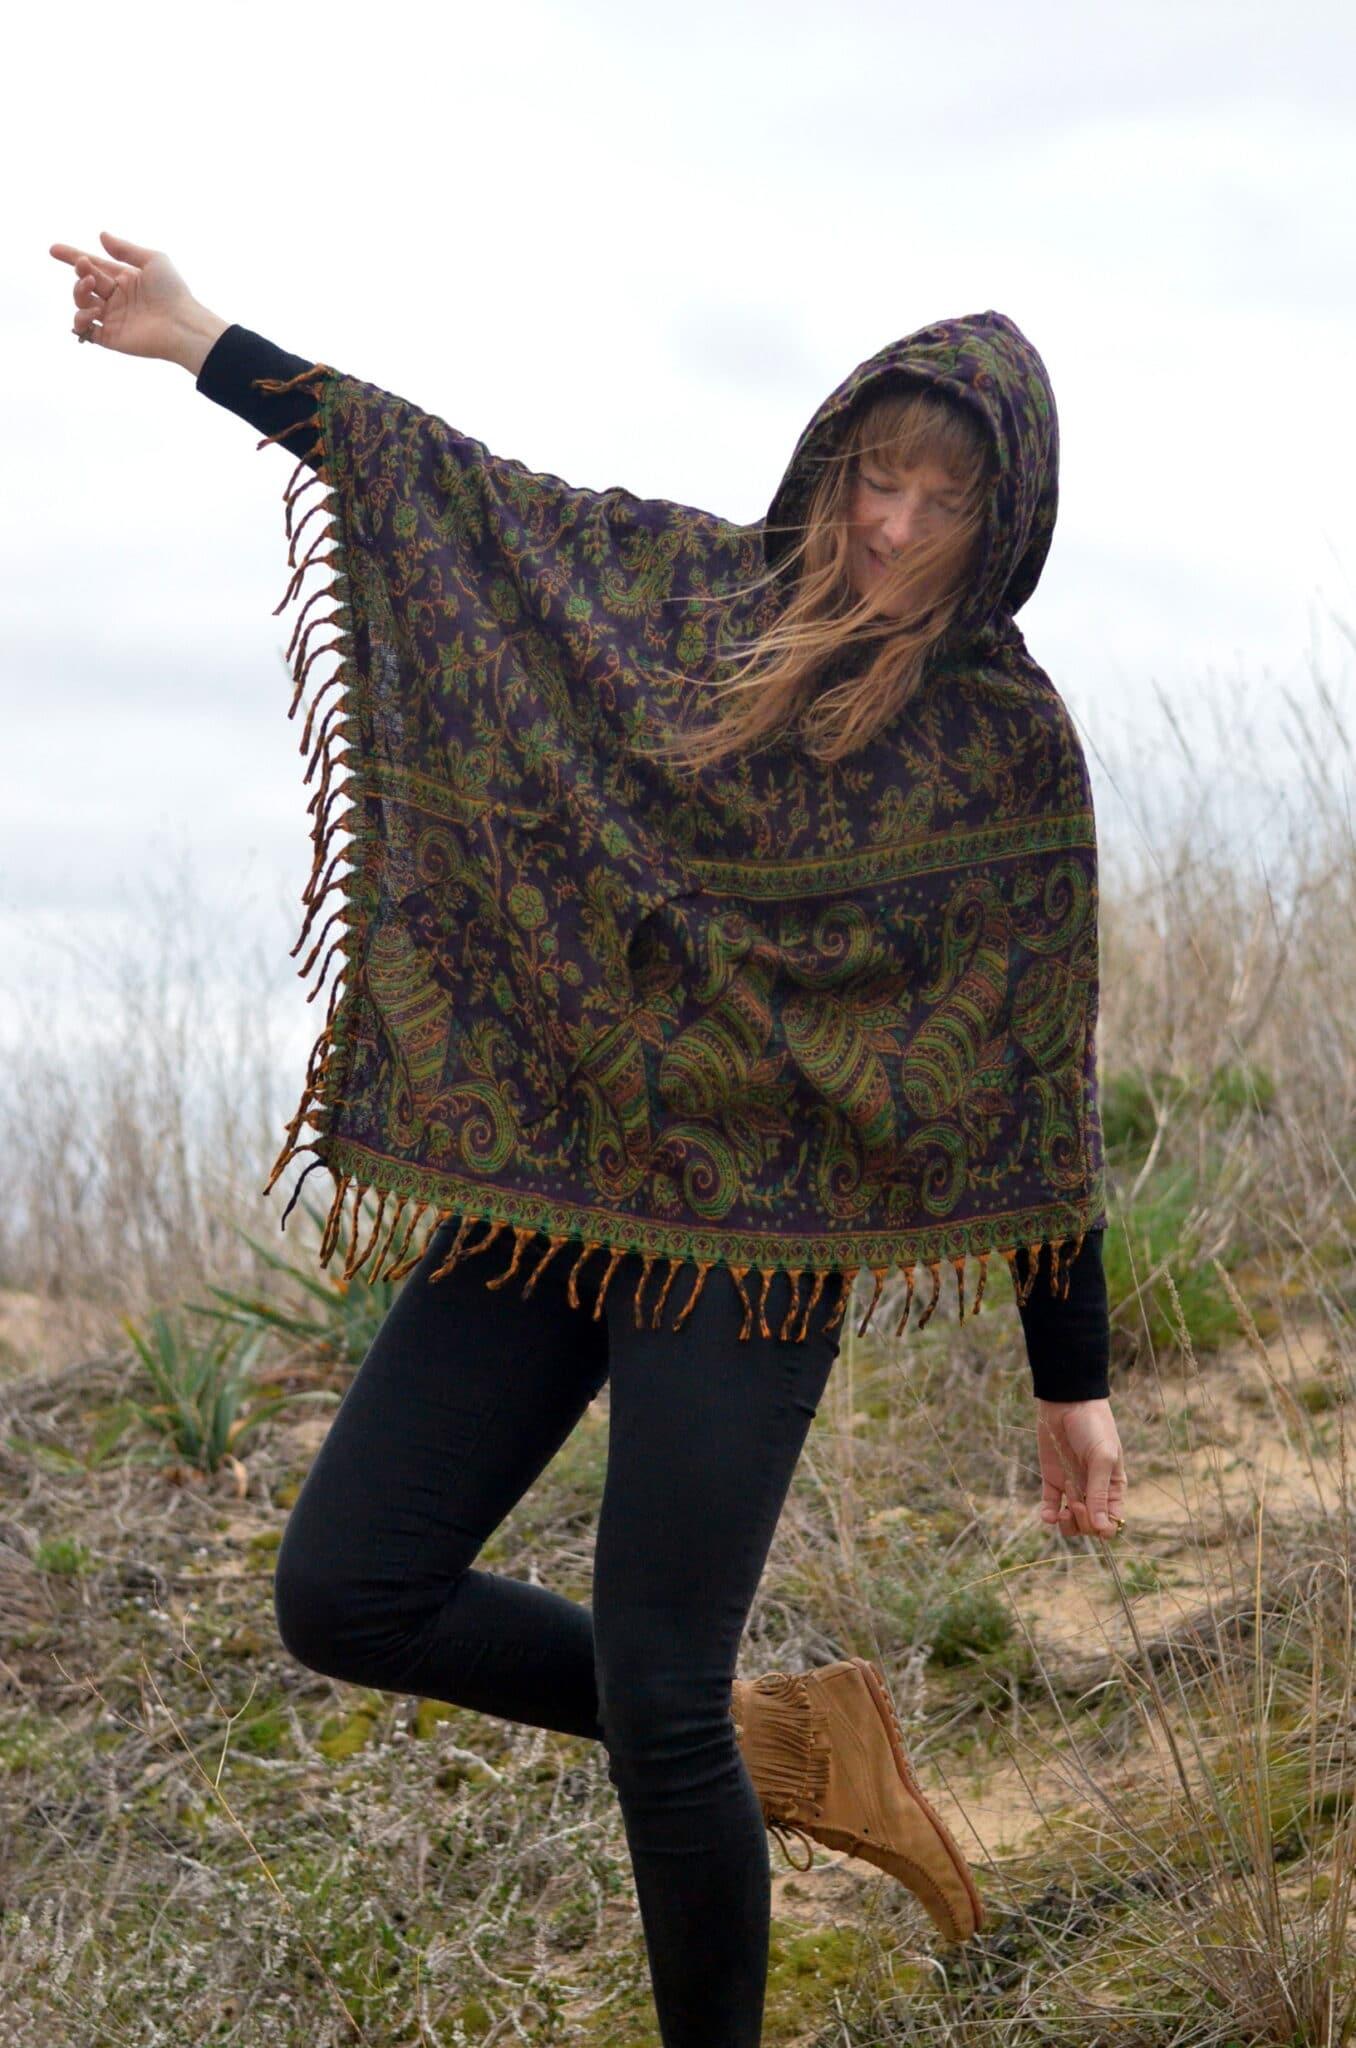 poncho-kapuze-paisley-hippie-shop-nachhaltigponcho-kapuze-paisley-hippie-shop-nachhaltig